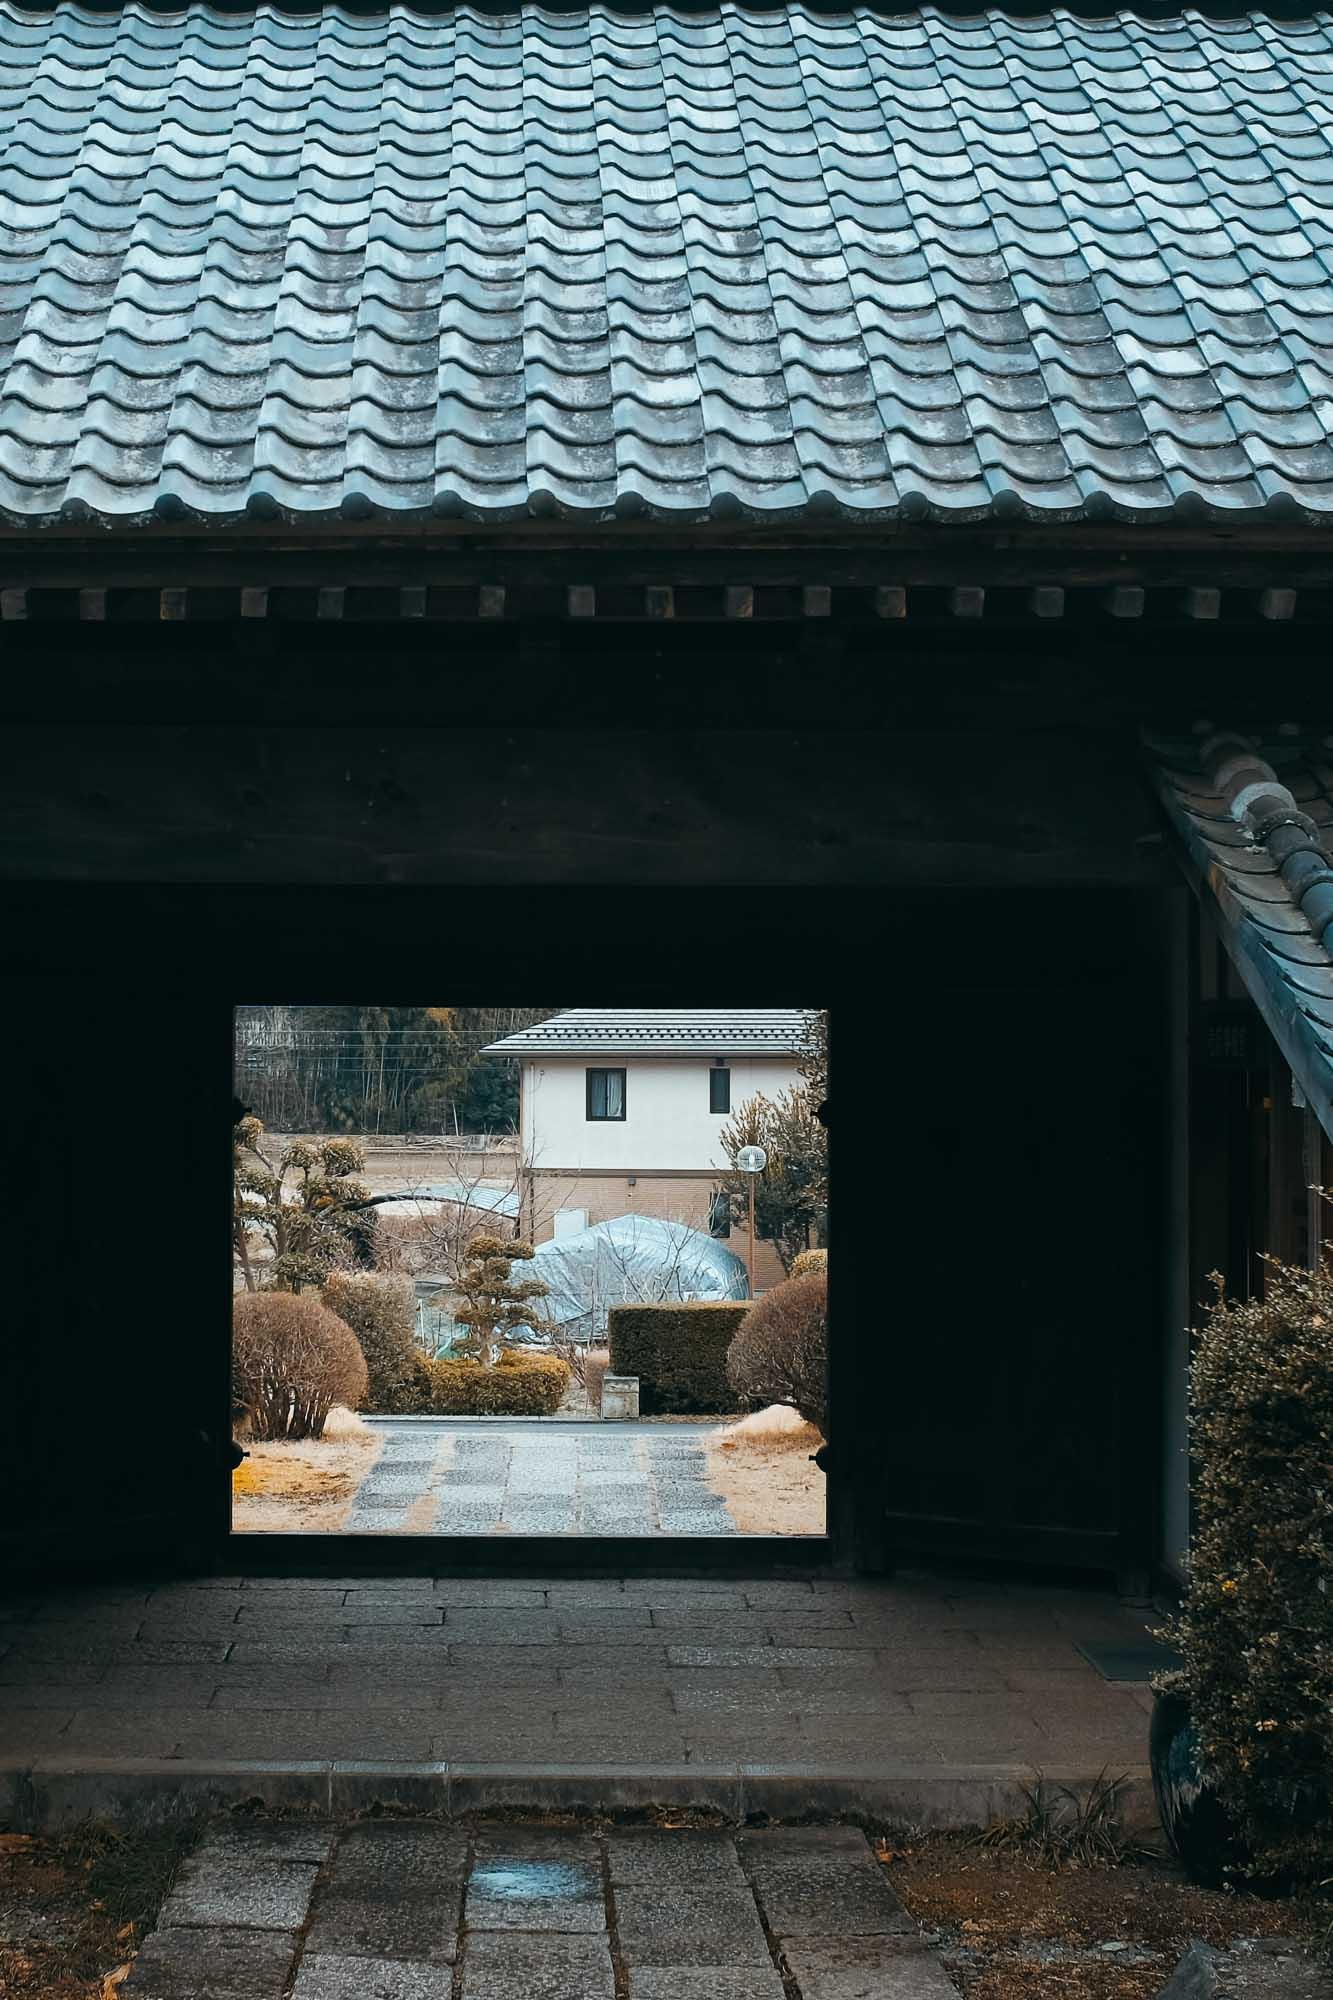 Shoji_Hamada_Sankokan_Museum_LowRes_13.jpg